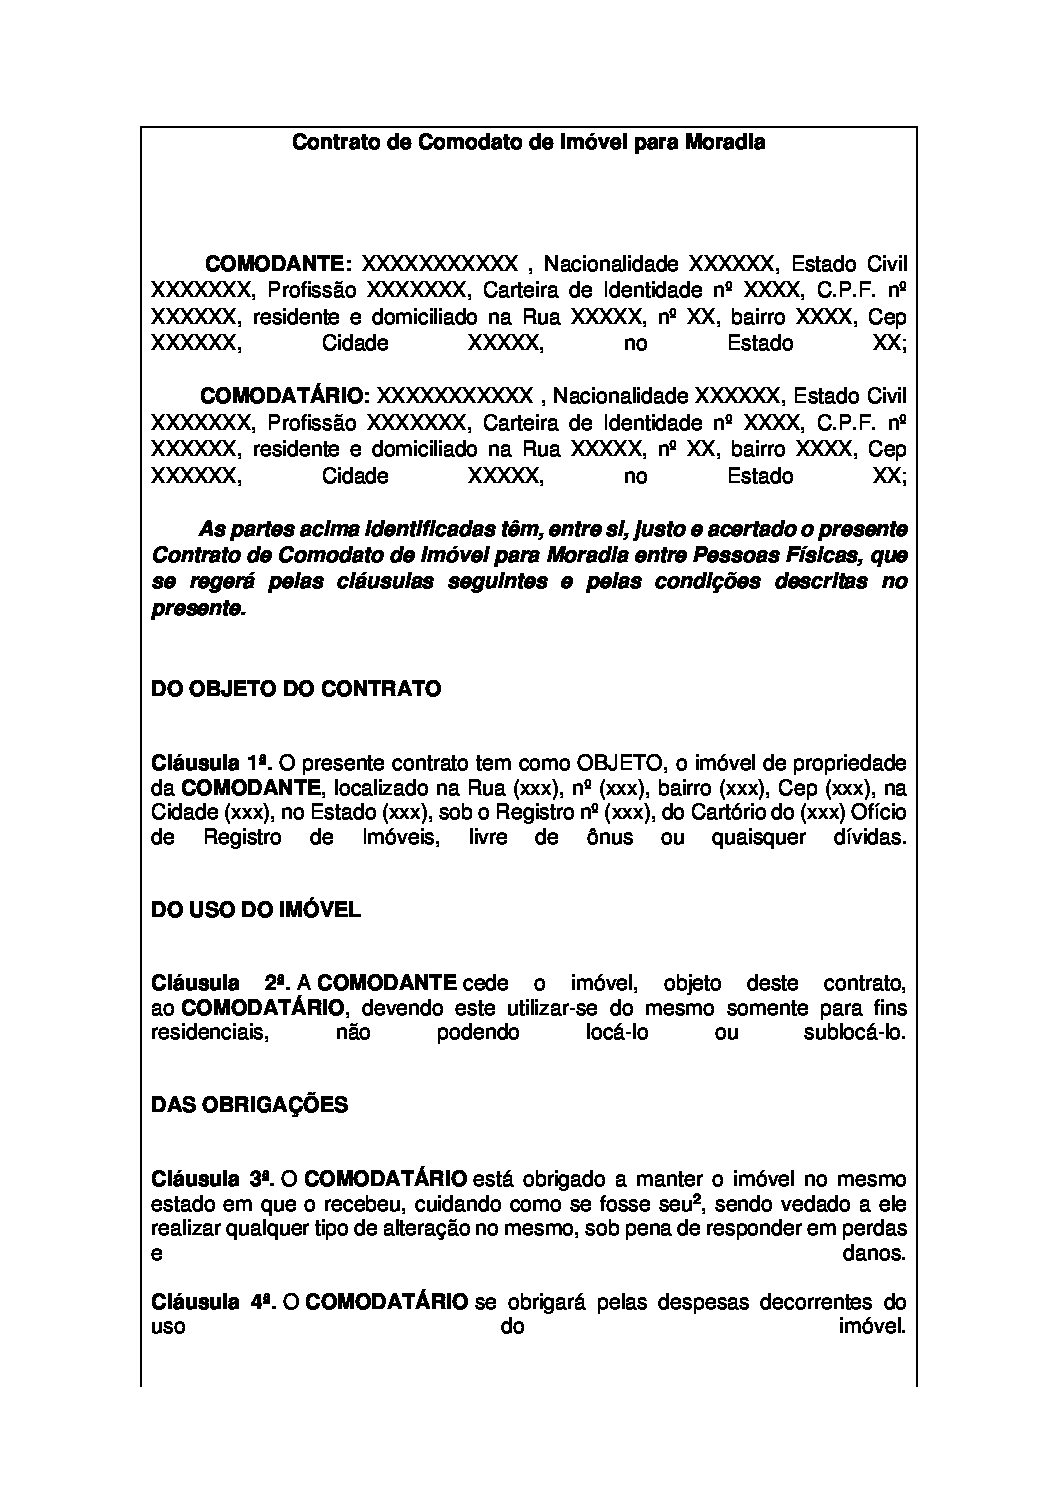 Contrato de Comodato de Imóvel para Moradia